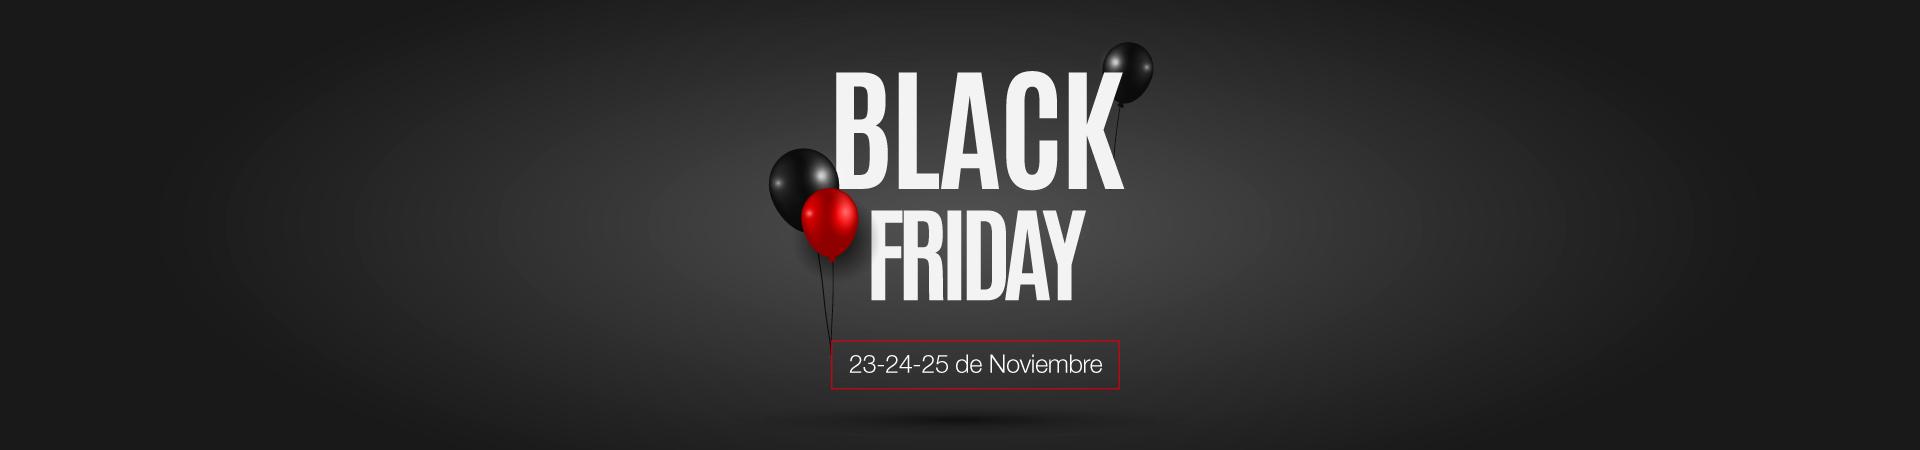 Black Friday Sin botón